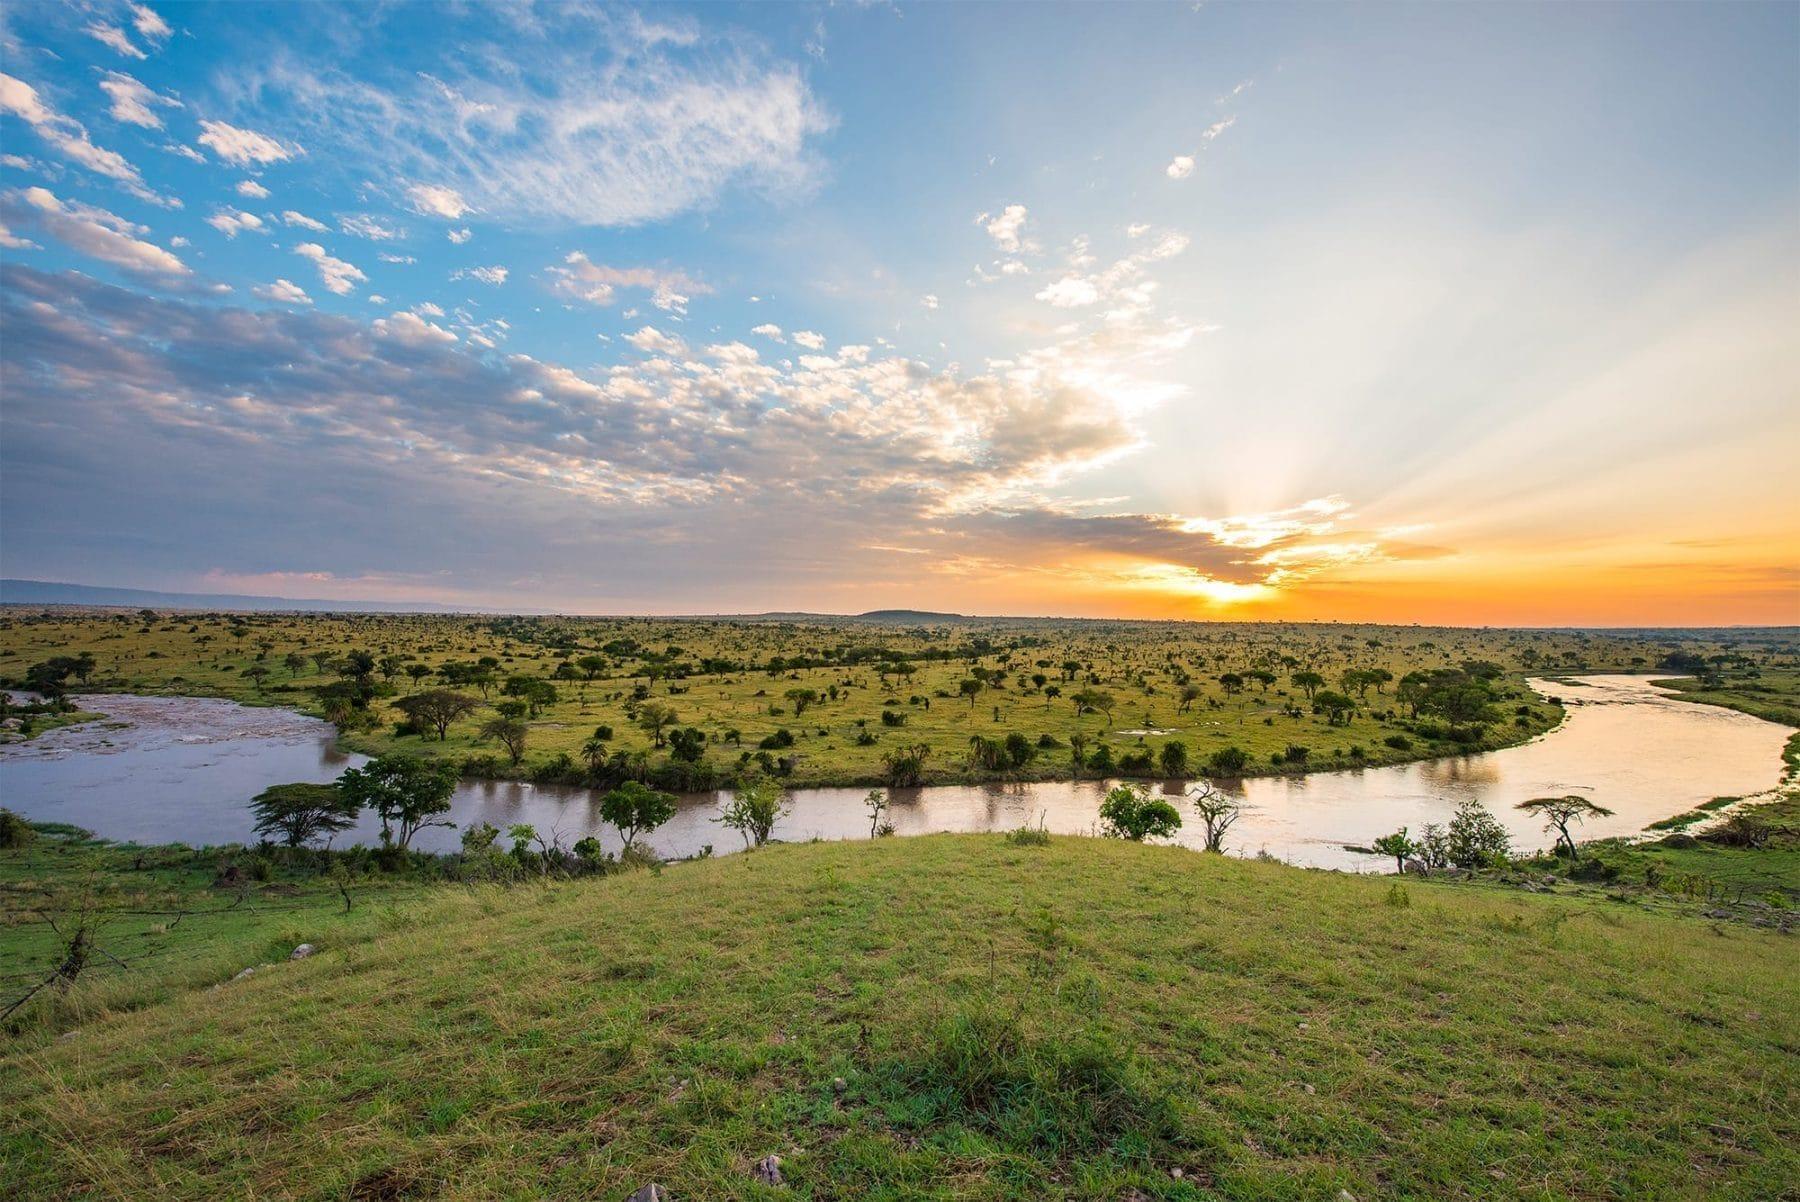 viajes-africa-circuitos-en-grupo-tanzani-serengeti